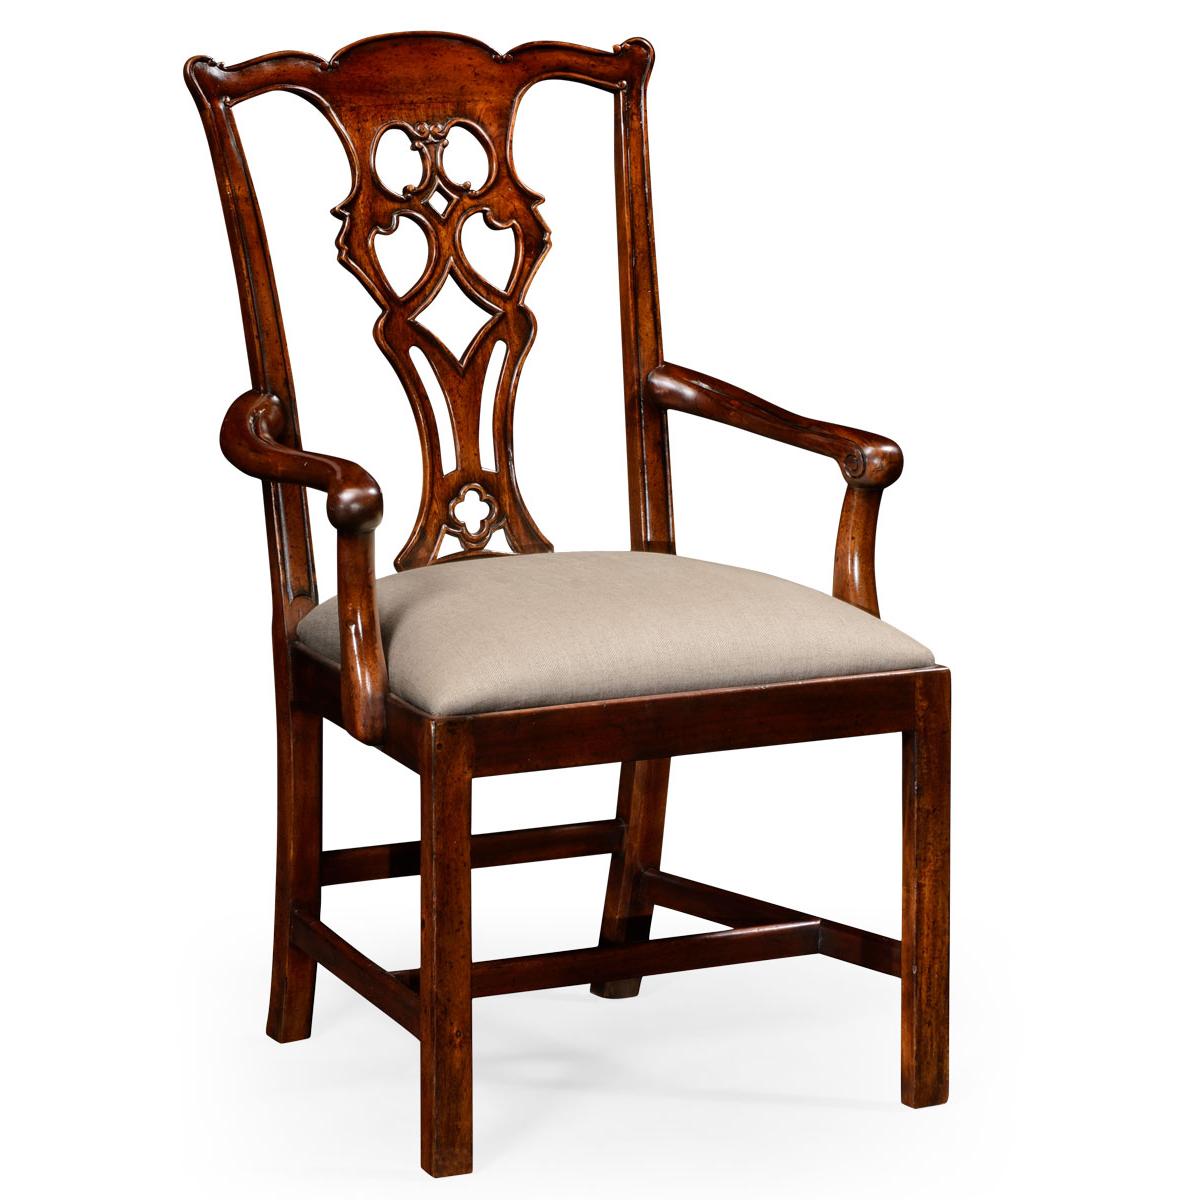 493331 Chippendale style classic mahogany armchair - на 360.ru: цены, описание, характеристики, где купить в Москве.